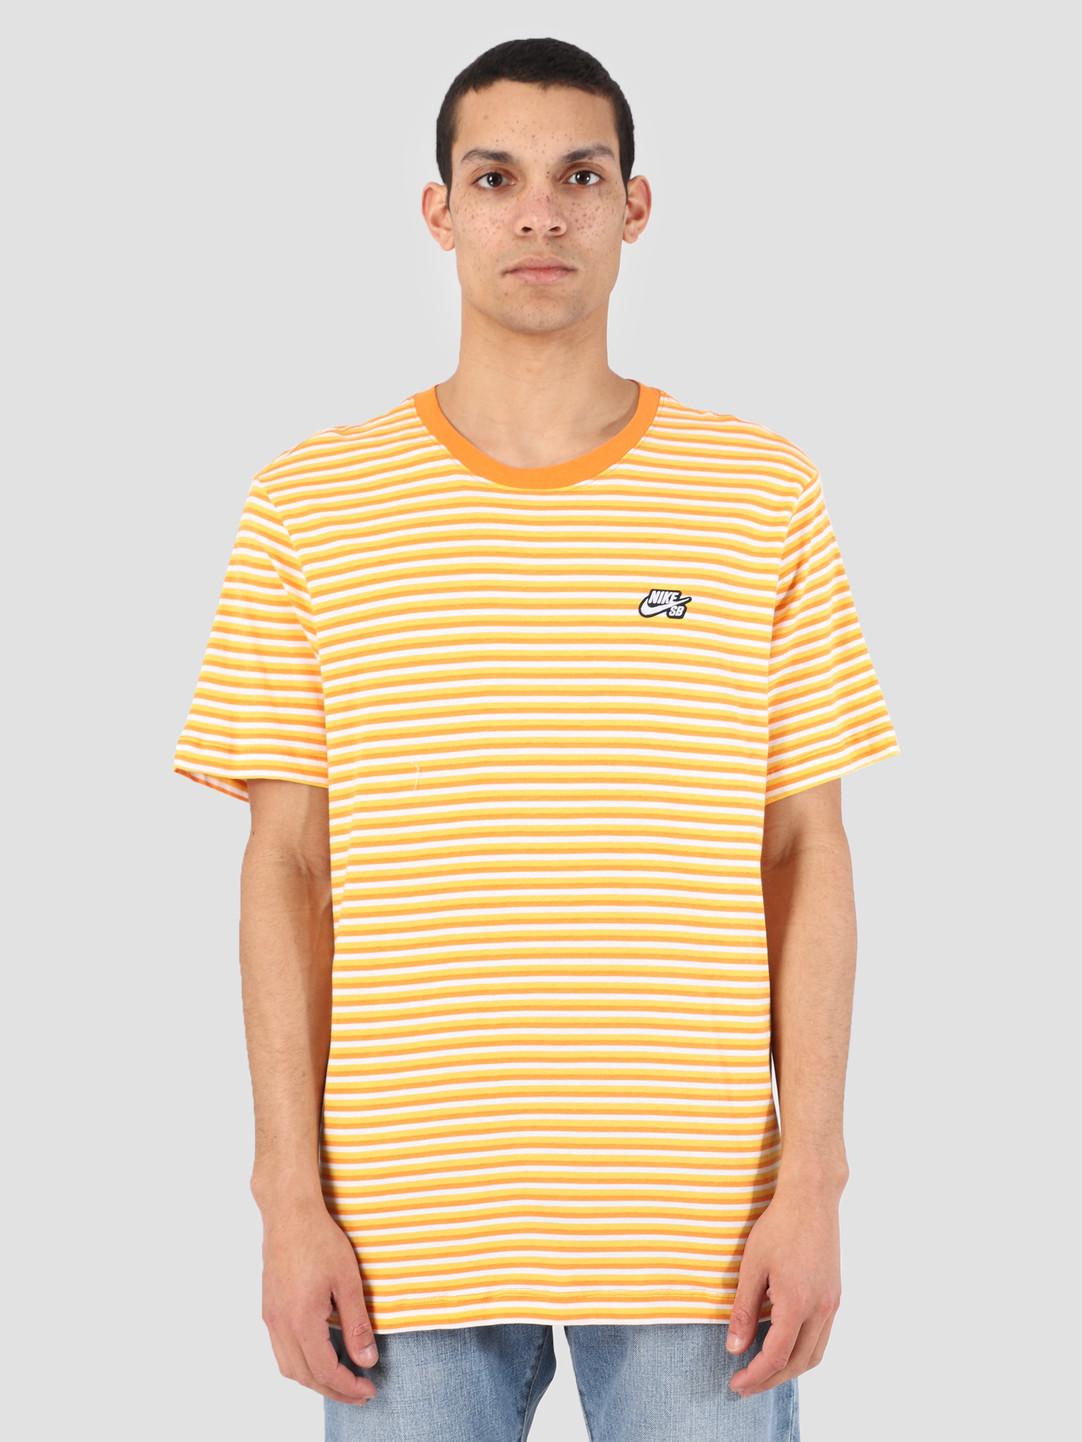 Nike Nike SB White Cinder Orange White Ao0392-101